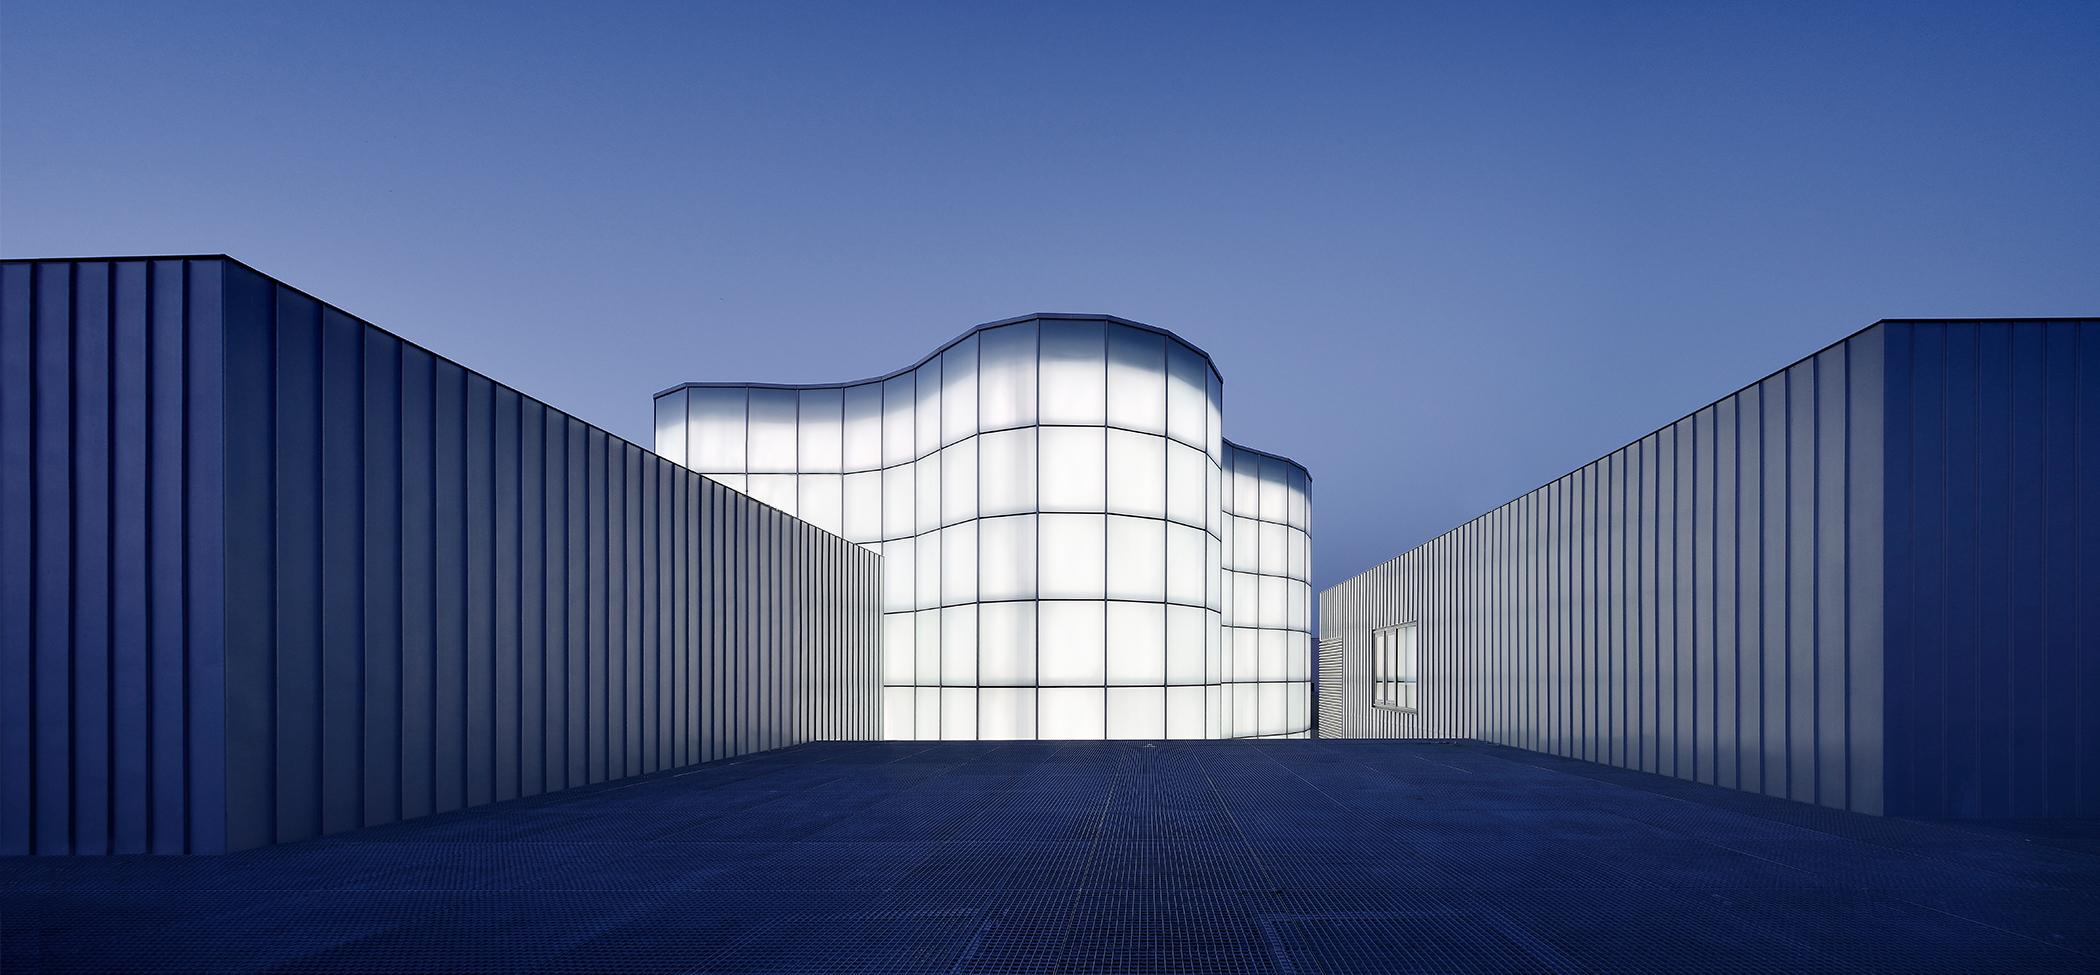 33891 33891 33891 & Innovative LED lighting solutions and lighting management - Zumtobel